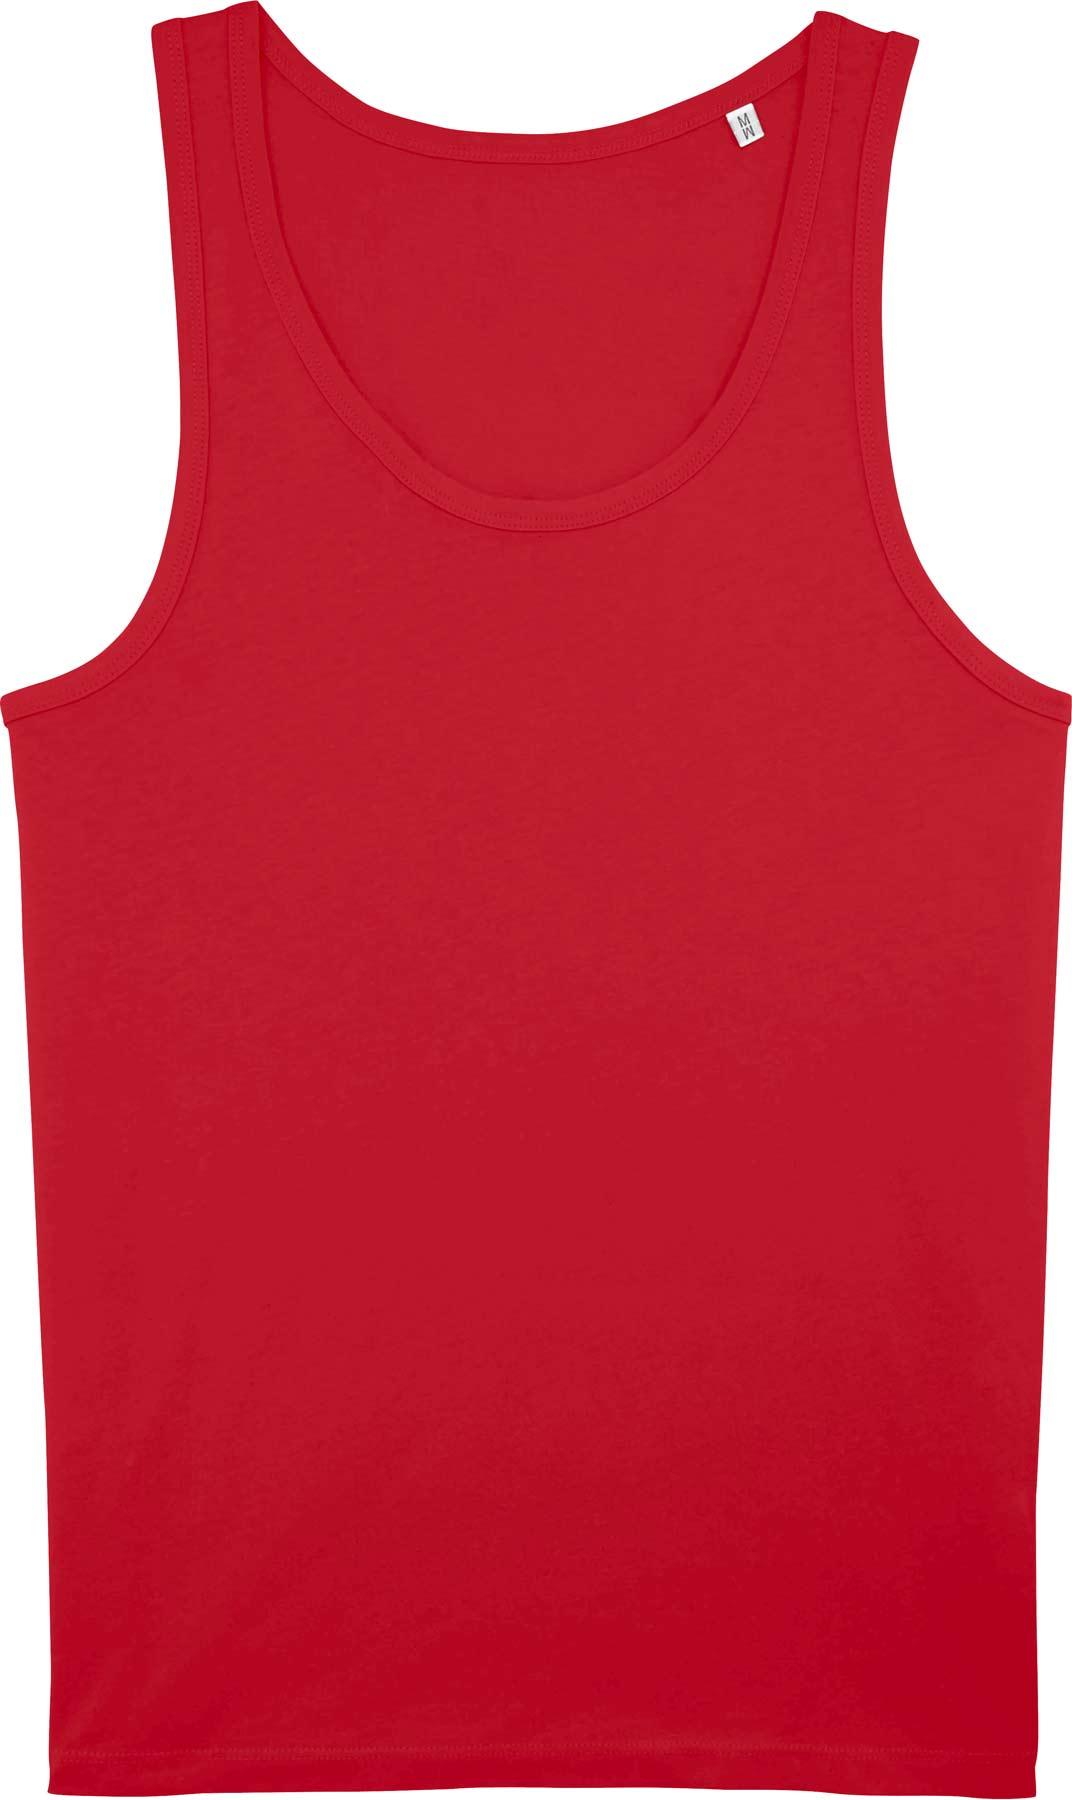 rotes herren tank top aus baumwolle unterhemd rot. Black Bedroom Furniture Sets. Home Design Ideas